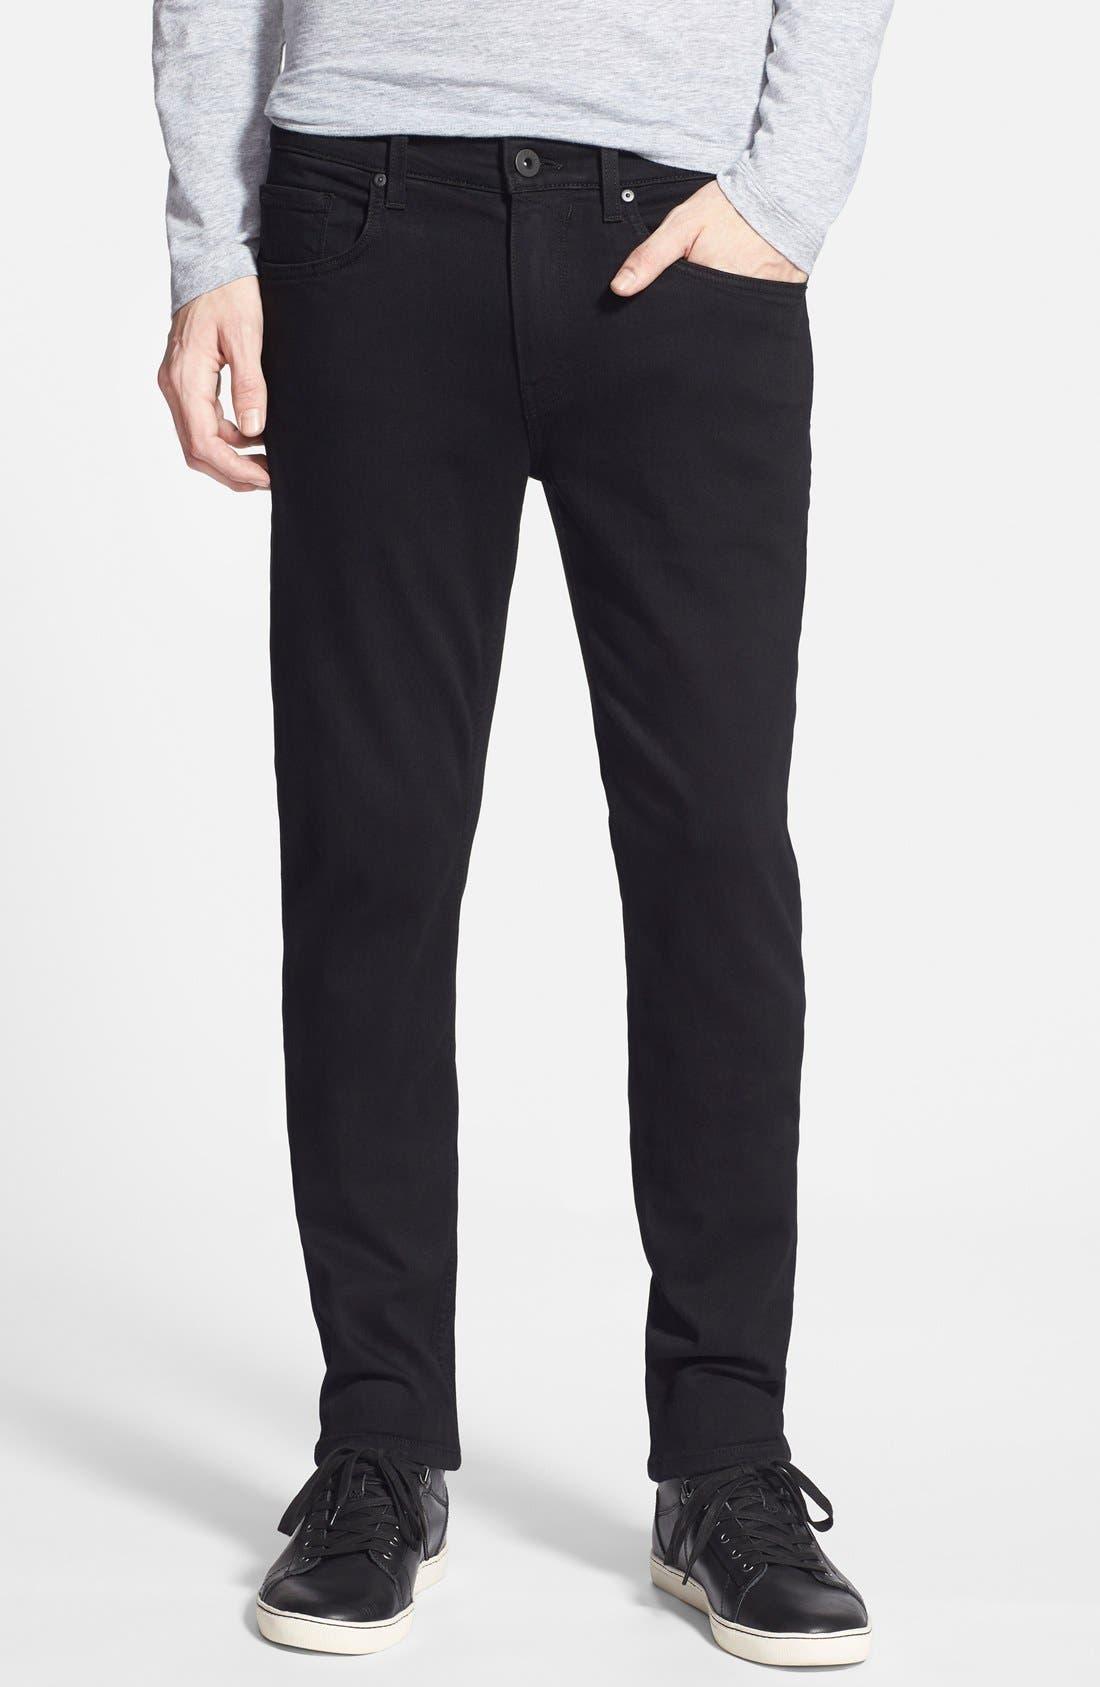 Main Image - PAIGE Transcend - Lennox XL Slim Fit Jeans (Black Shadow) (Tall)